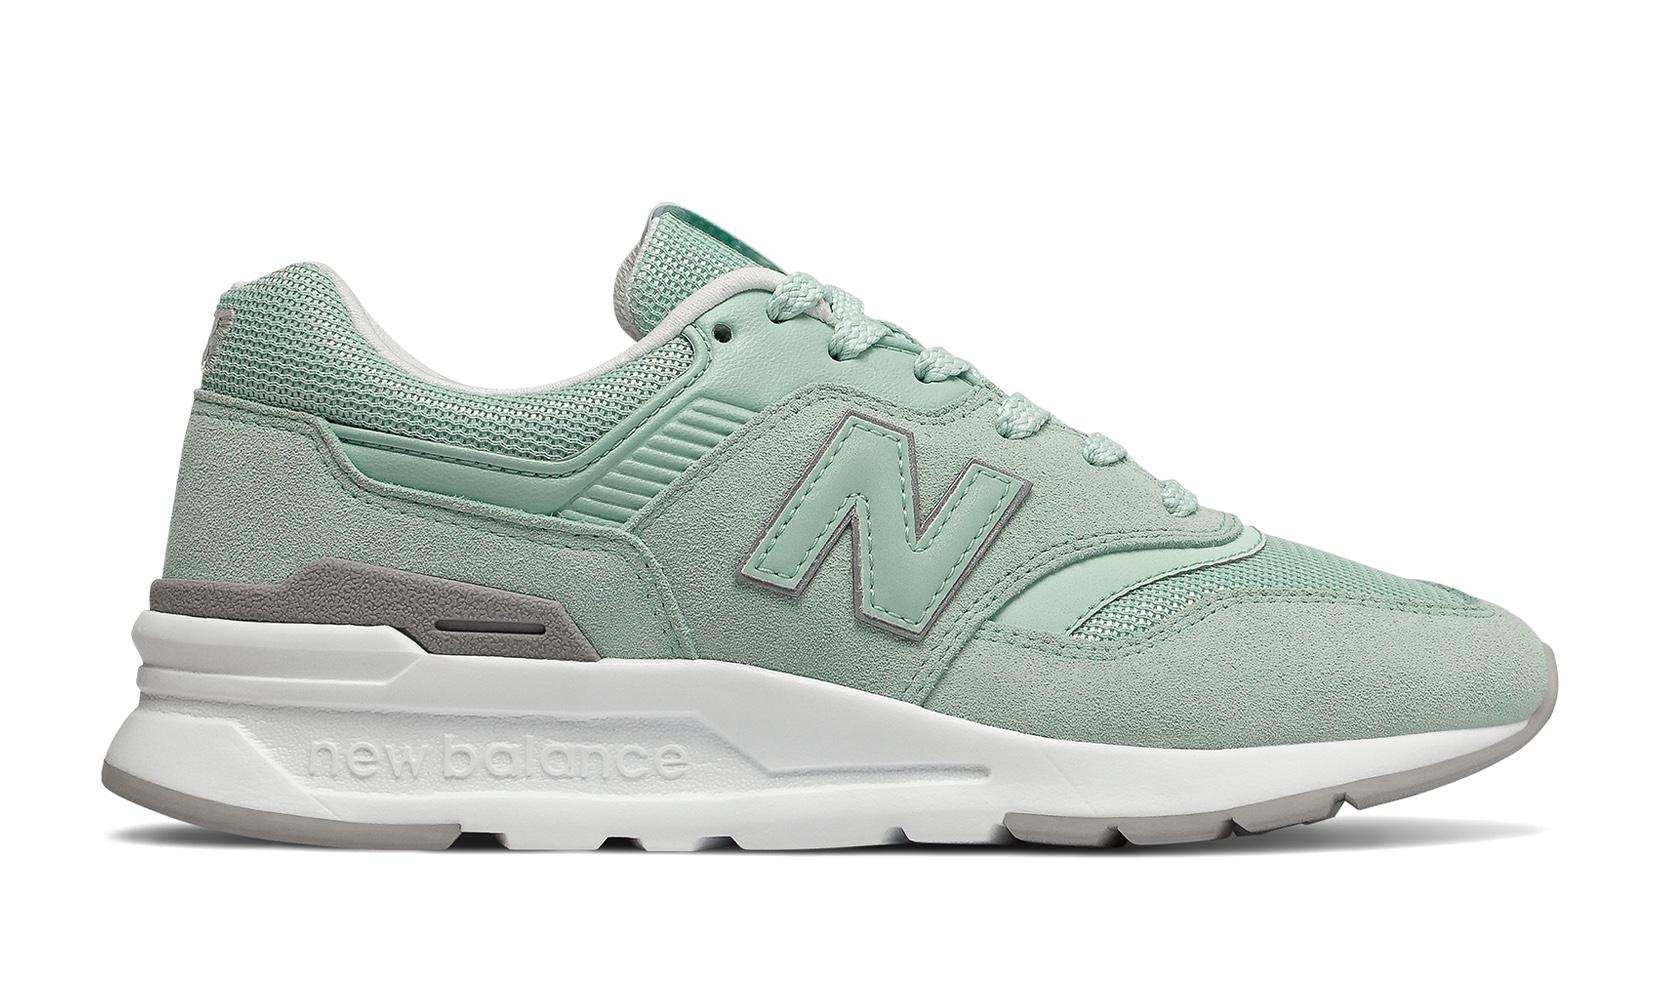 Жіноче взуття повсякденне New Balance 997H CW997HCA | New Balance